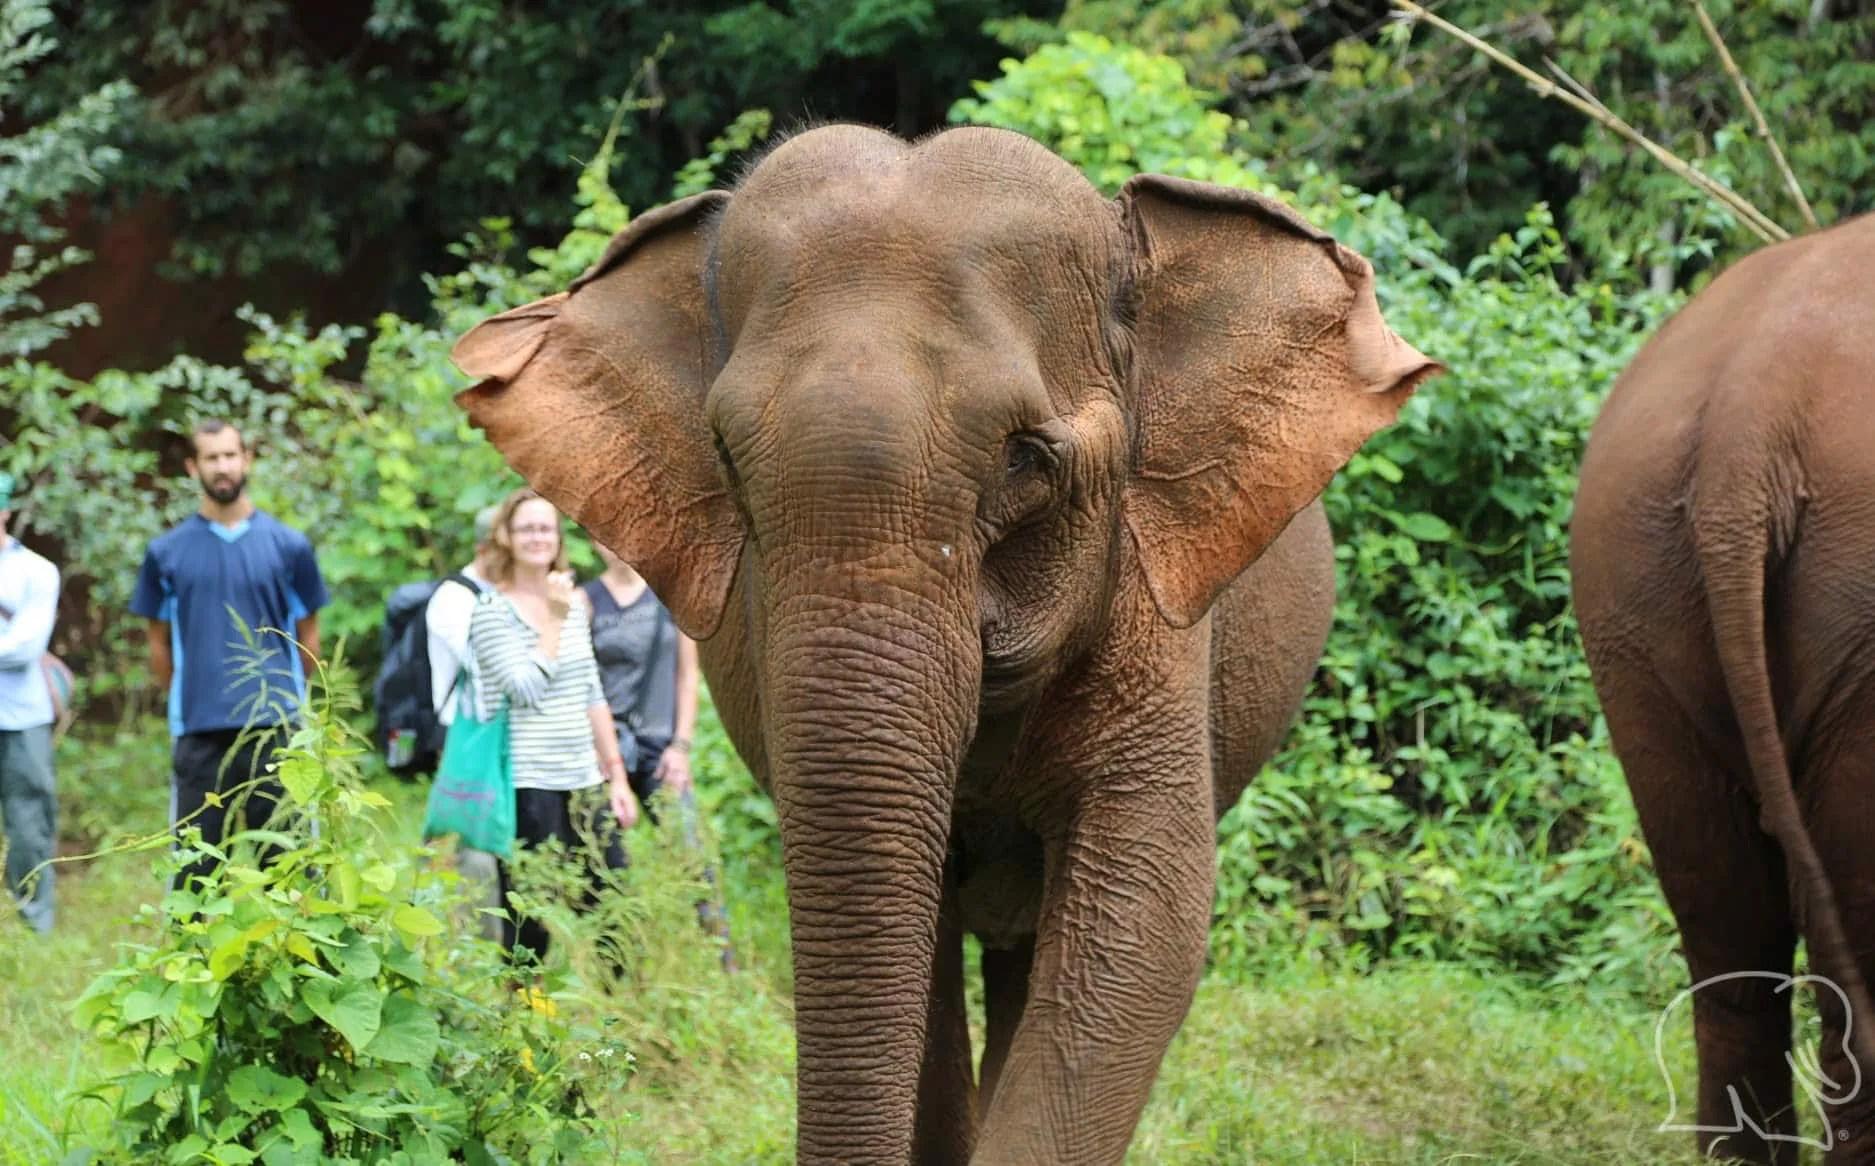 Volunteers with the elephants